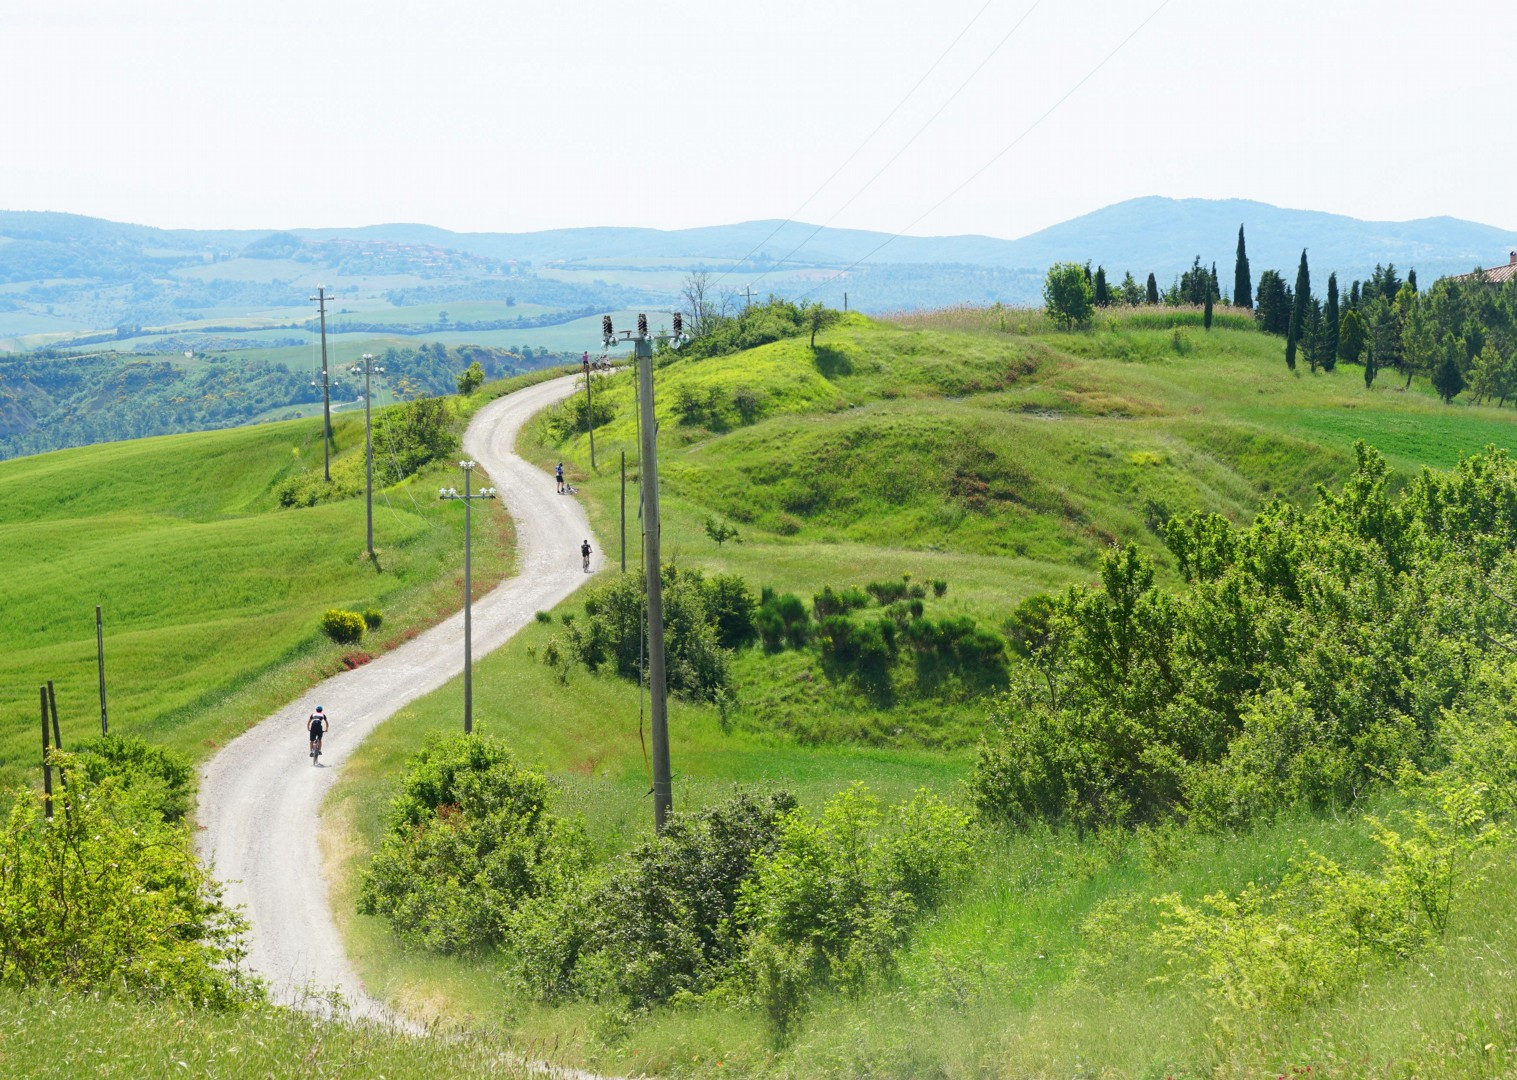 35066948333_5ca5db8afc_o.jpg - Italy - Via Francigena (Tuscany to Rome) - Guided Mountain Biking Holiday - Mountain Biking